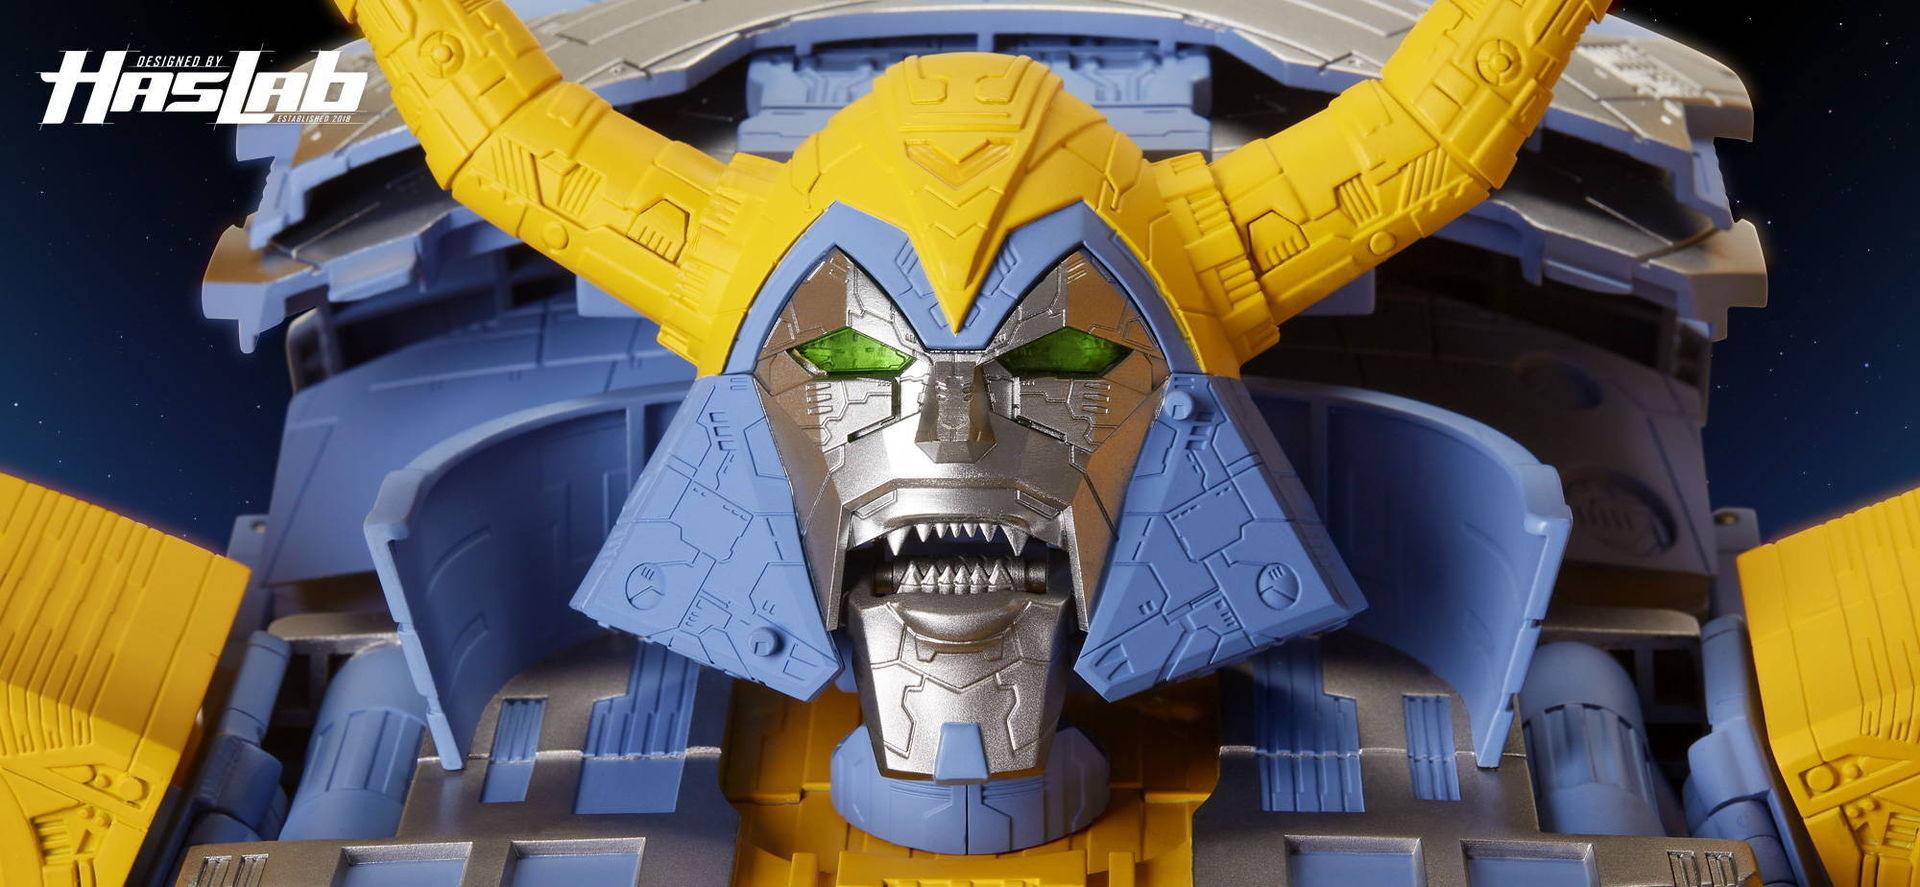 Hasbro crowdfundar Transformers-leksak